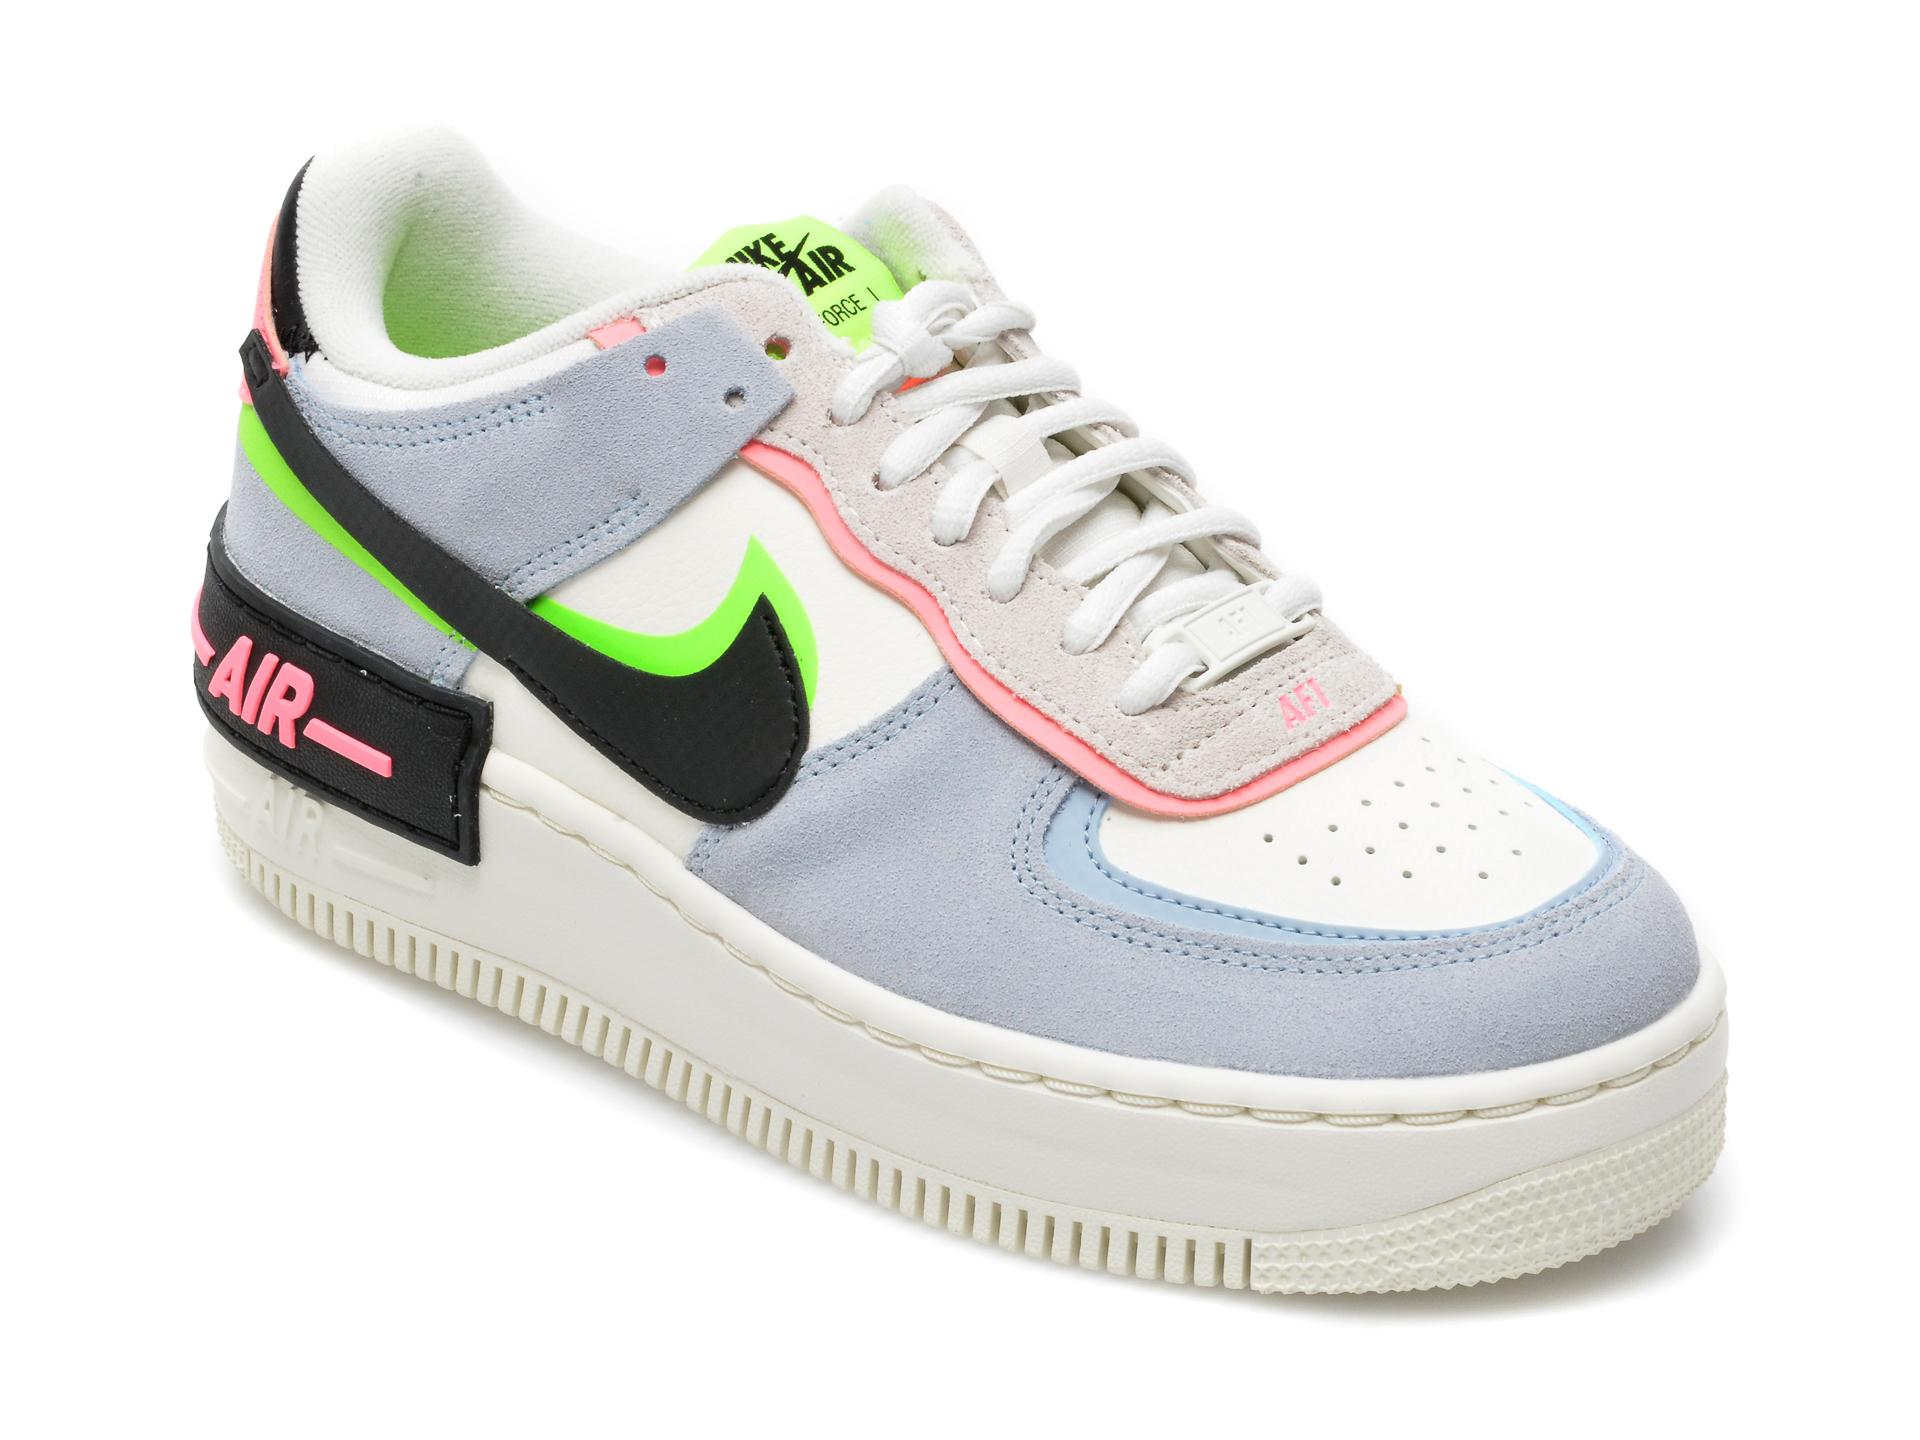 Pantofi sport NIKE multicolor, W Af1 Shadow, din piele naturala imagine otter.ro